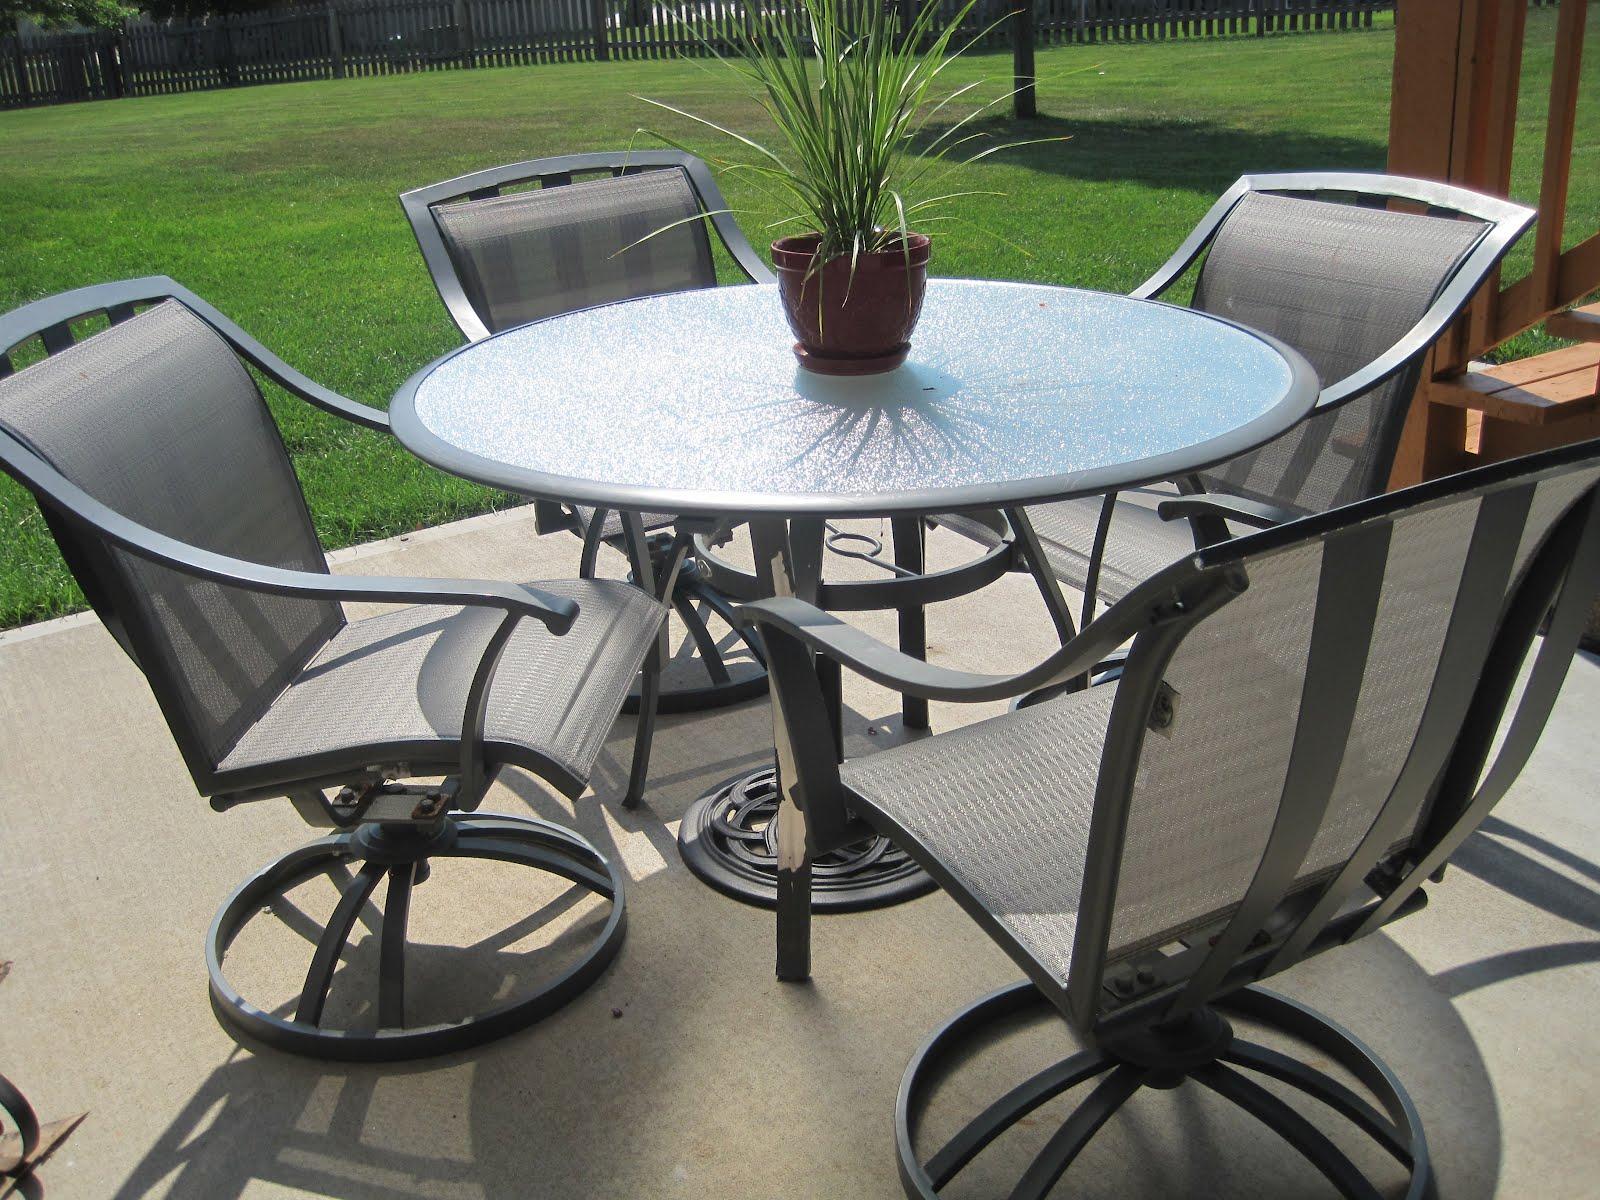 Guide purpose is to Hampton bay patio furniture  Patio